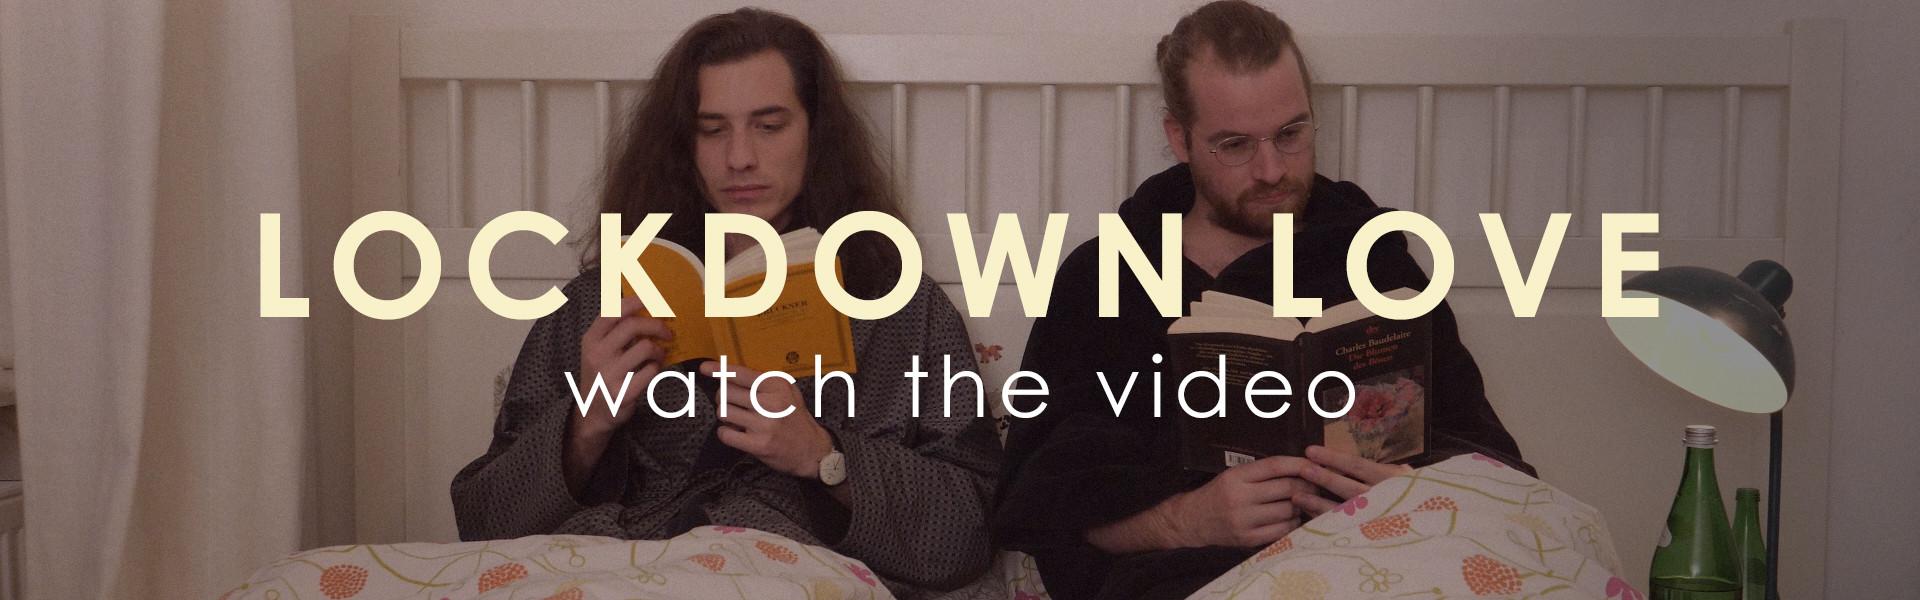 Lockdown Love Video Button.jpg